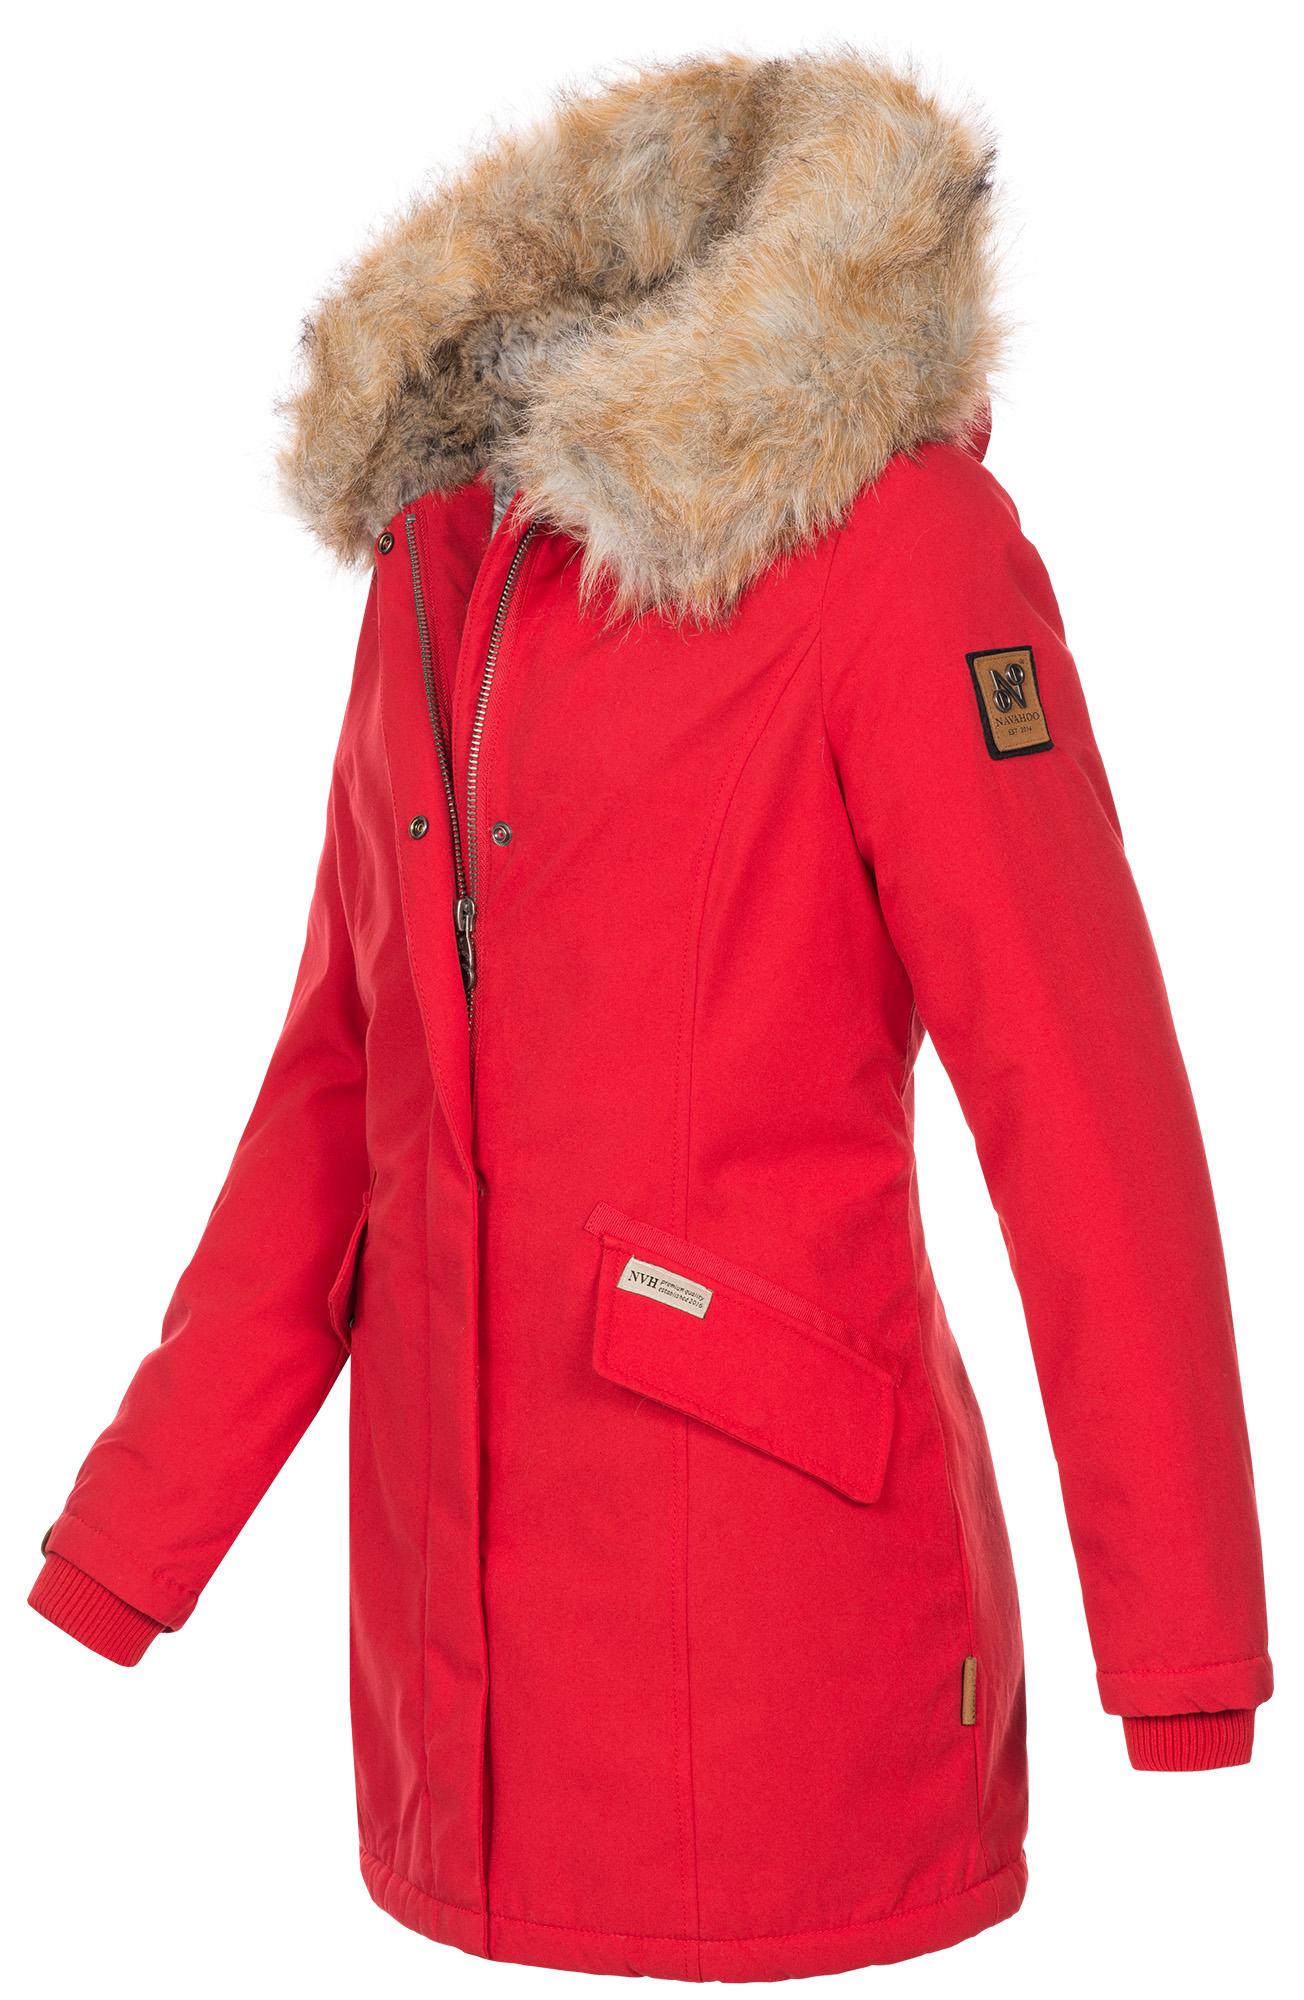 Navahoo-Premium-Damen-Winter-Jacke-Parka-Mantel-Winterjacke-warm-Kunstfell-B669 Indexbild 14